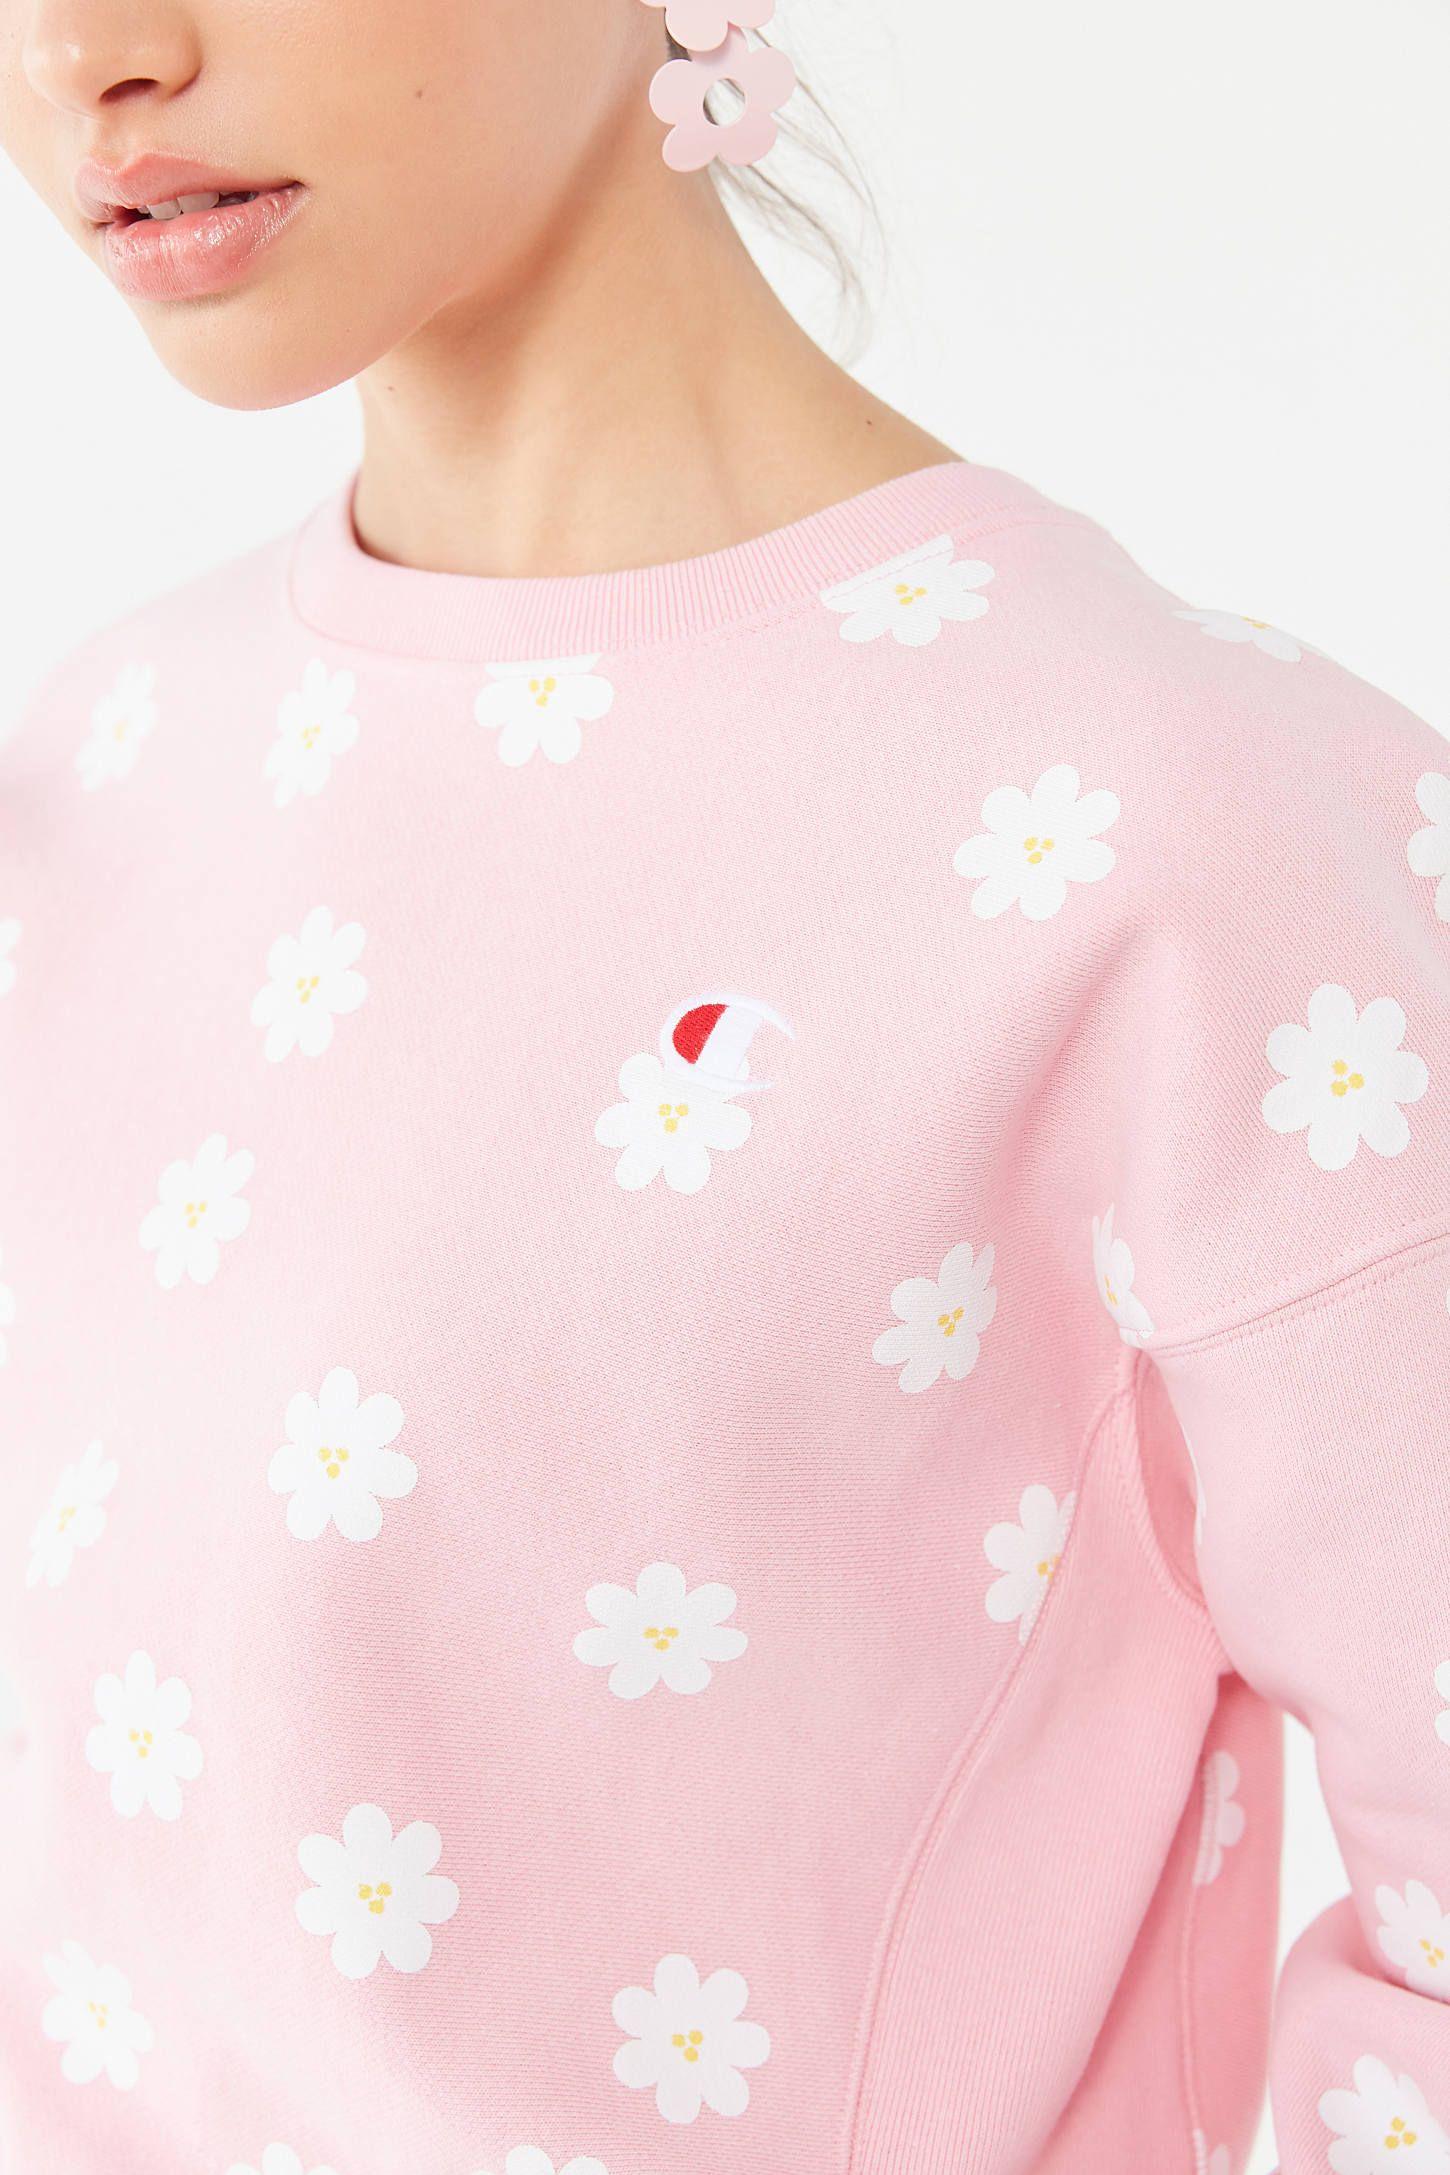 Pin By Claire On Fall 2019 Crew Neck Sweatshirt Sweatshirts Crew Neck [ 2175 x 1450 Pixel ]